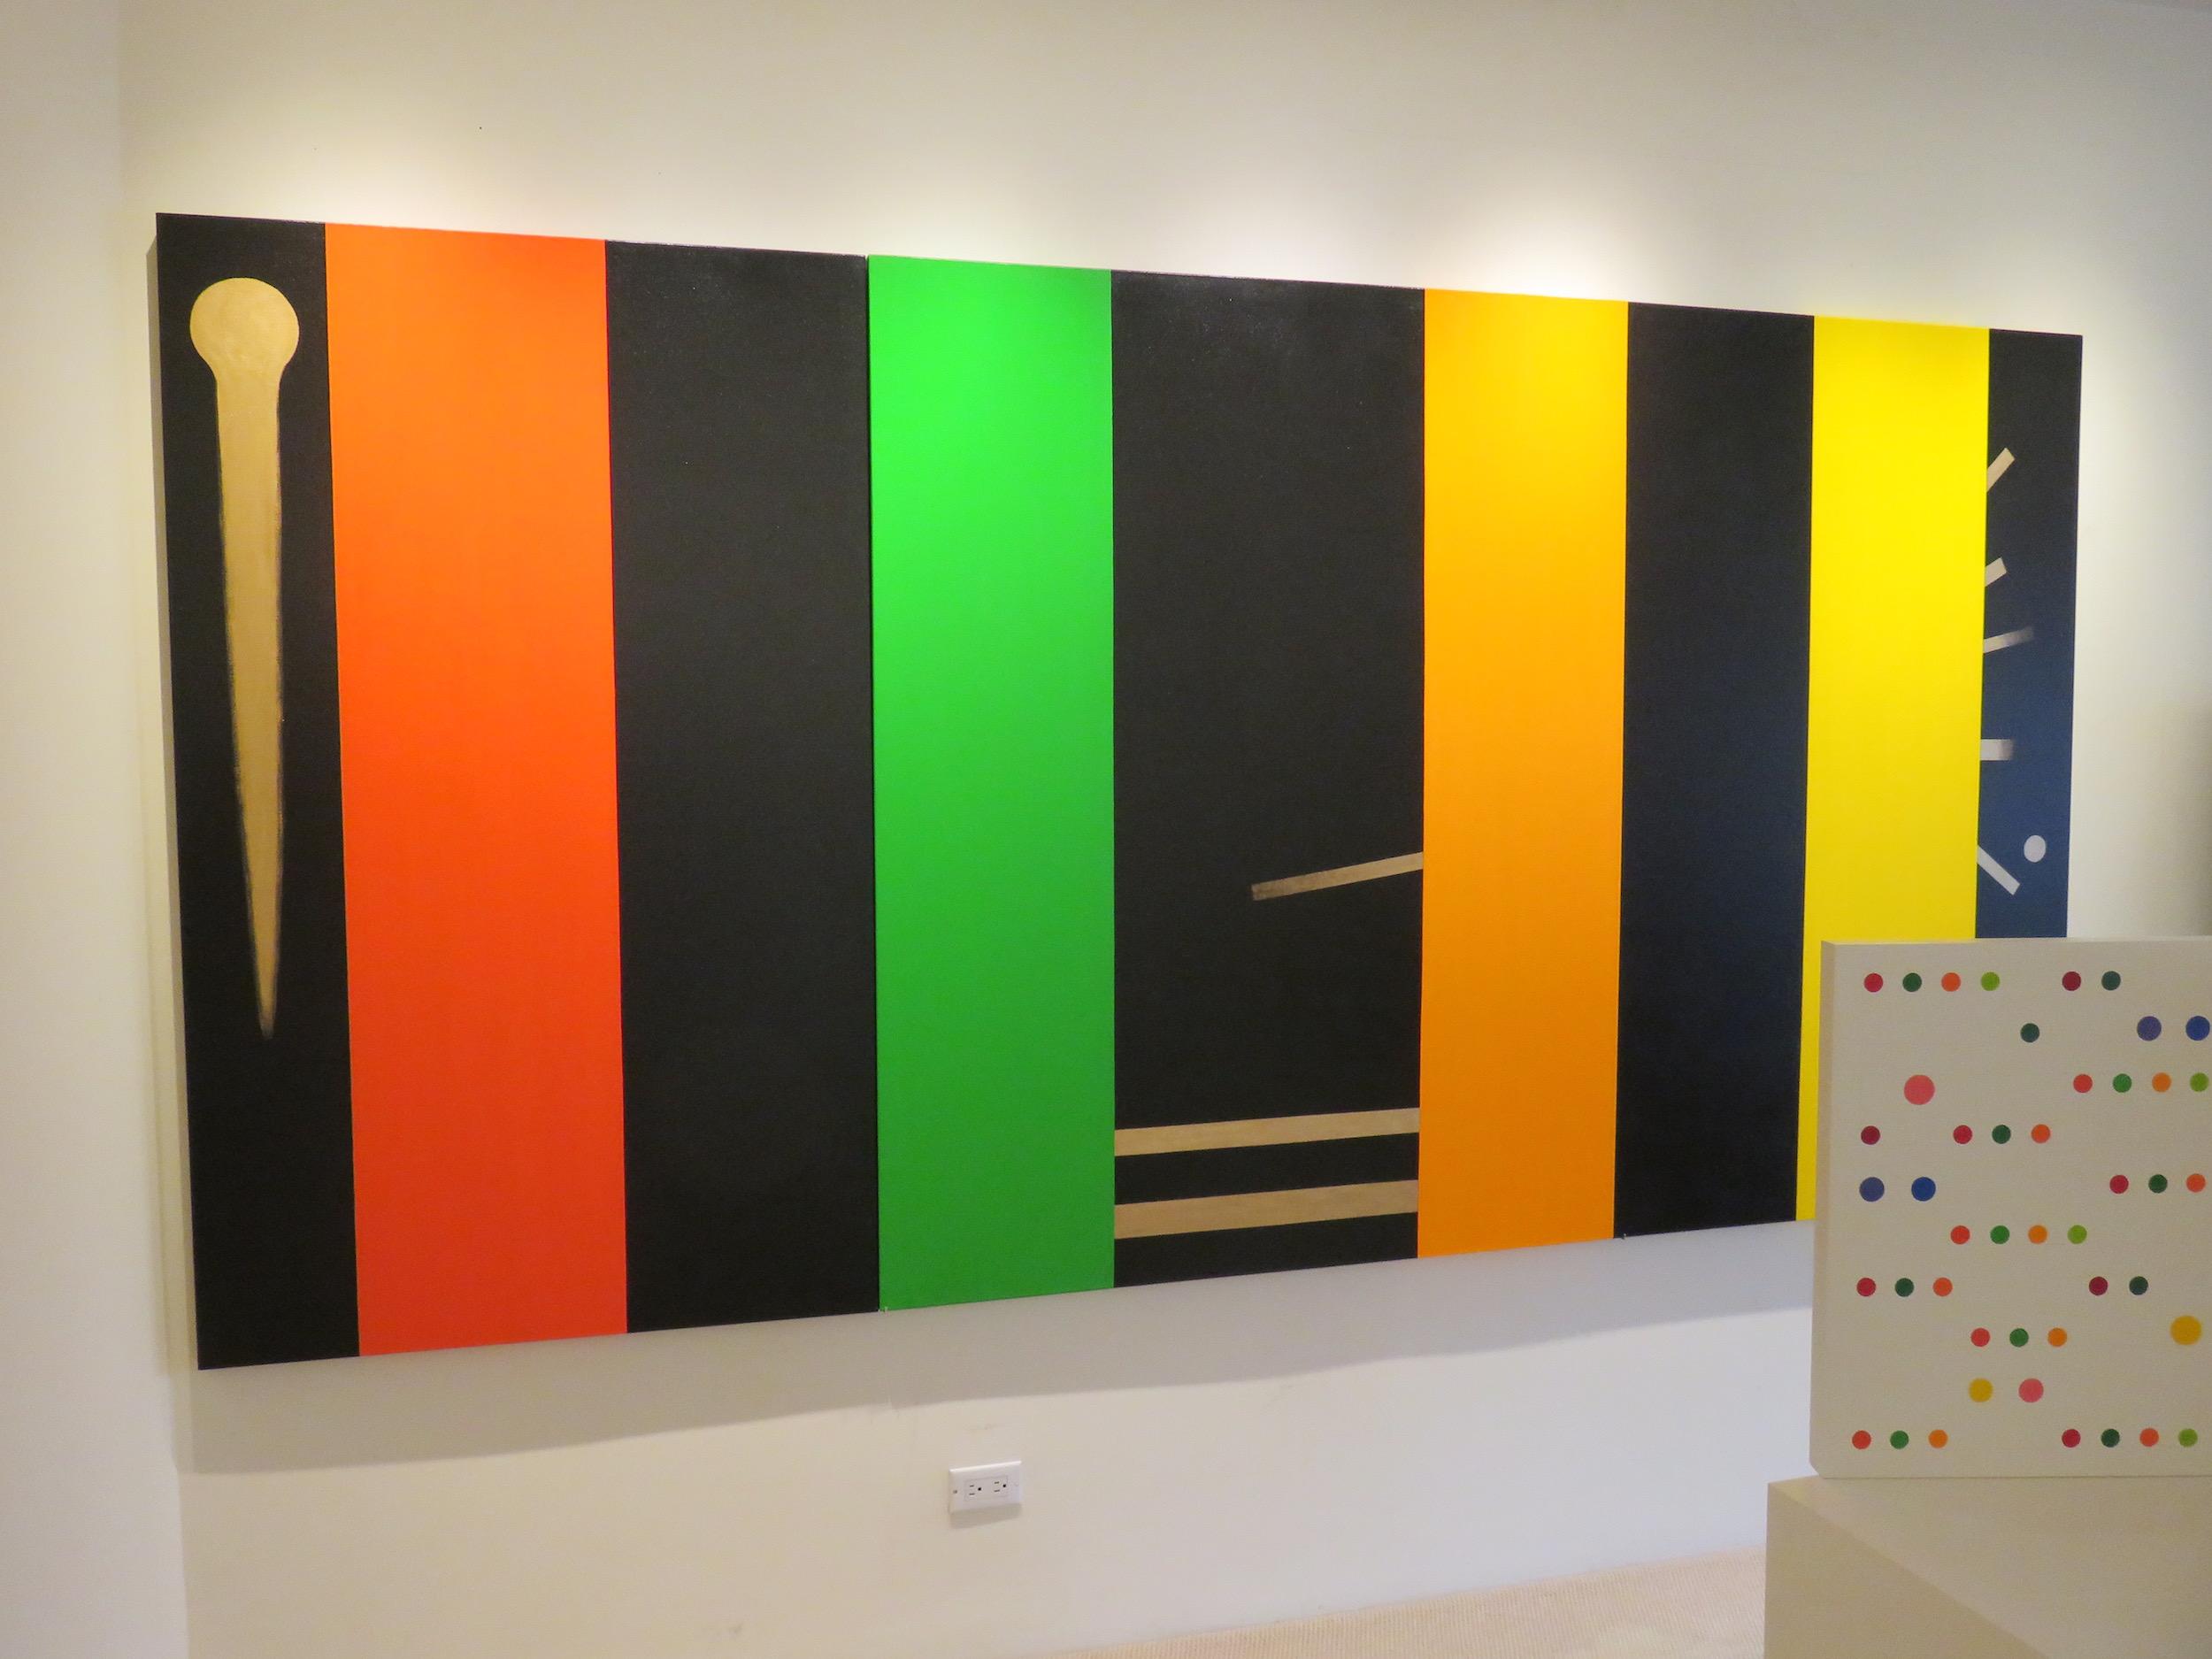 Above: Installation view,  Osvaldo Mariscotti: New Paintings and Sculpture , Upsilon Gallery, New York, 2017.